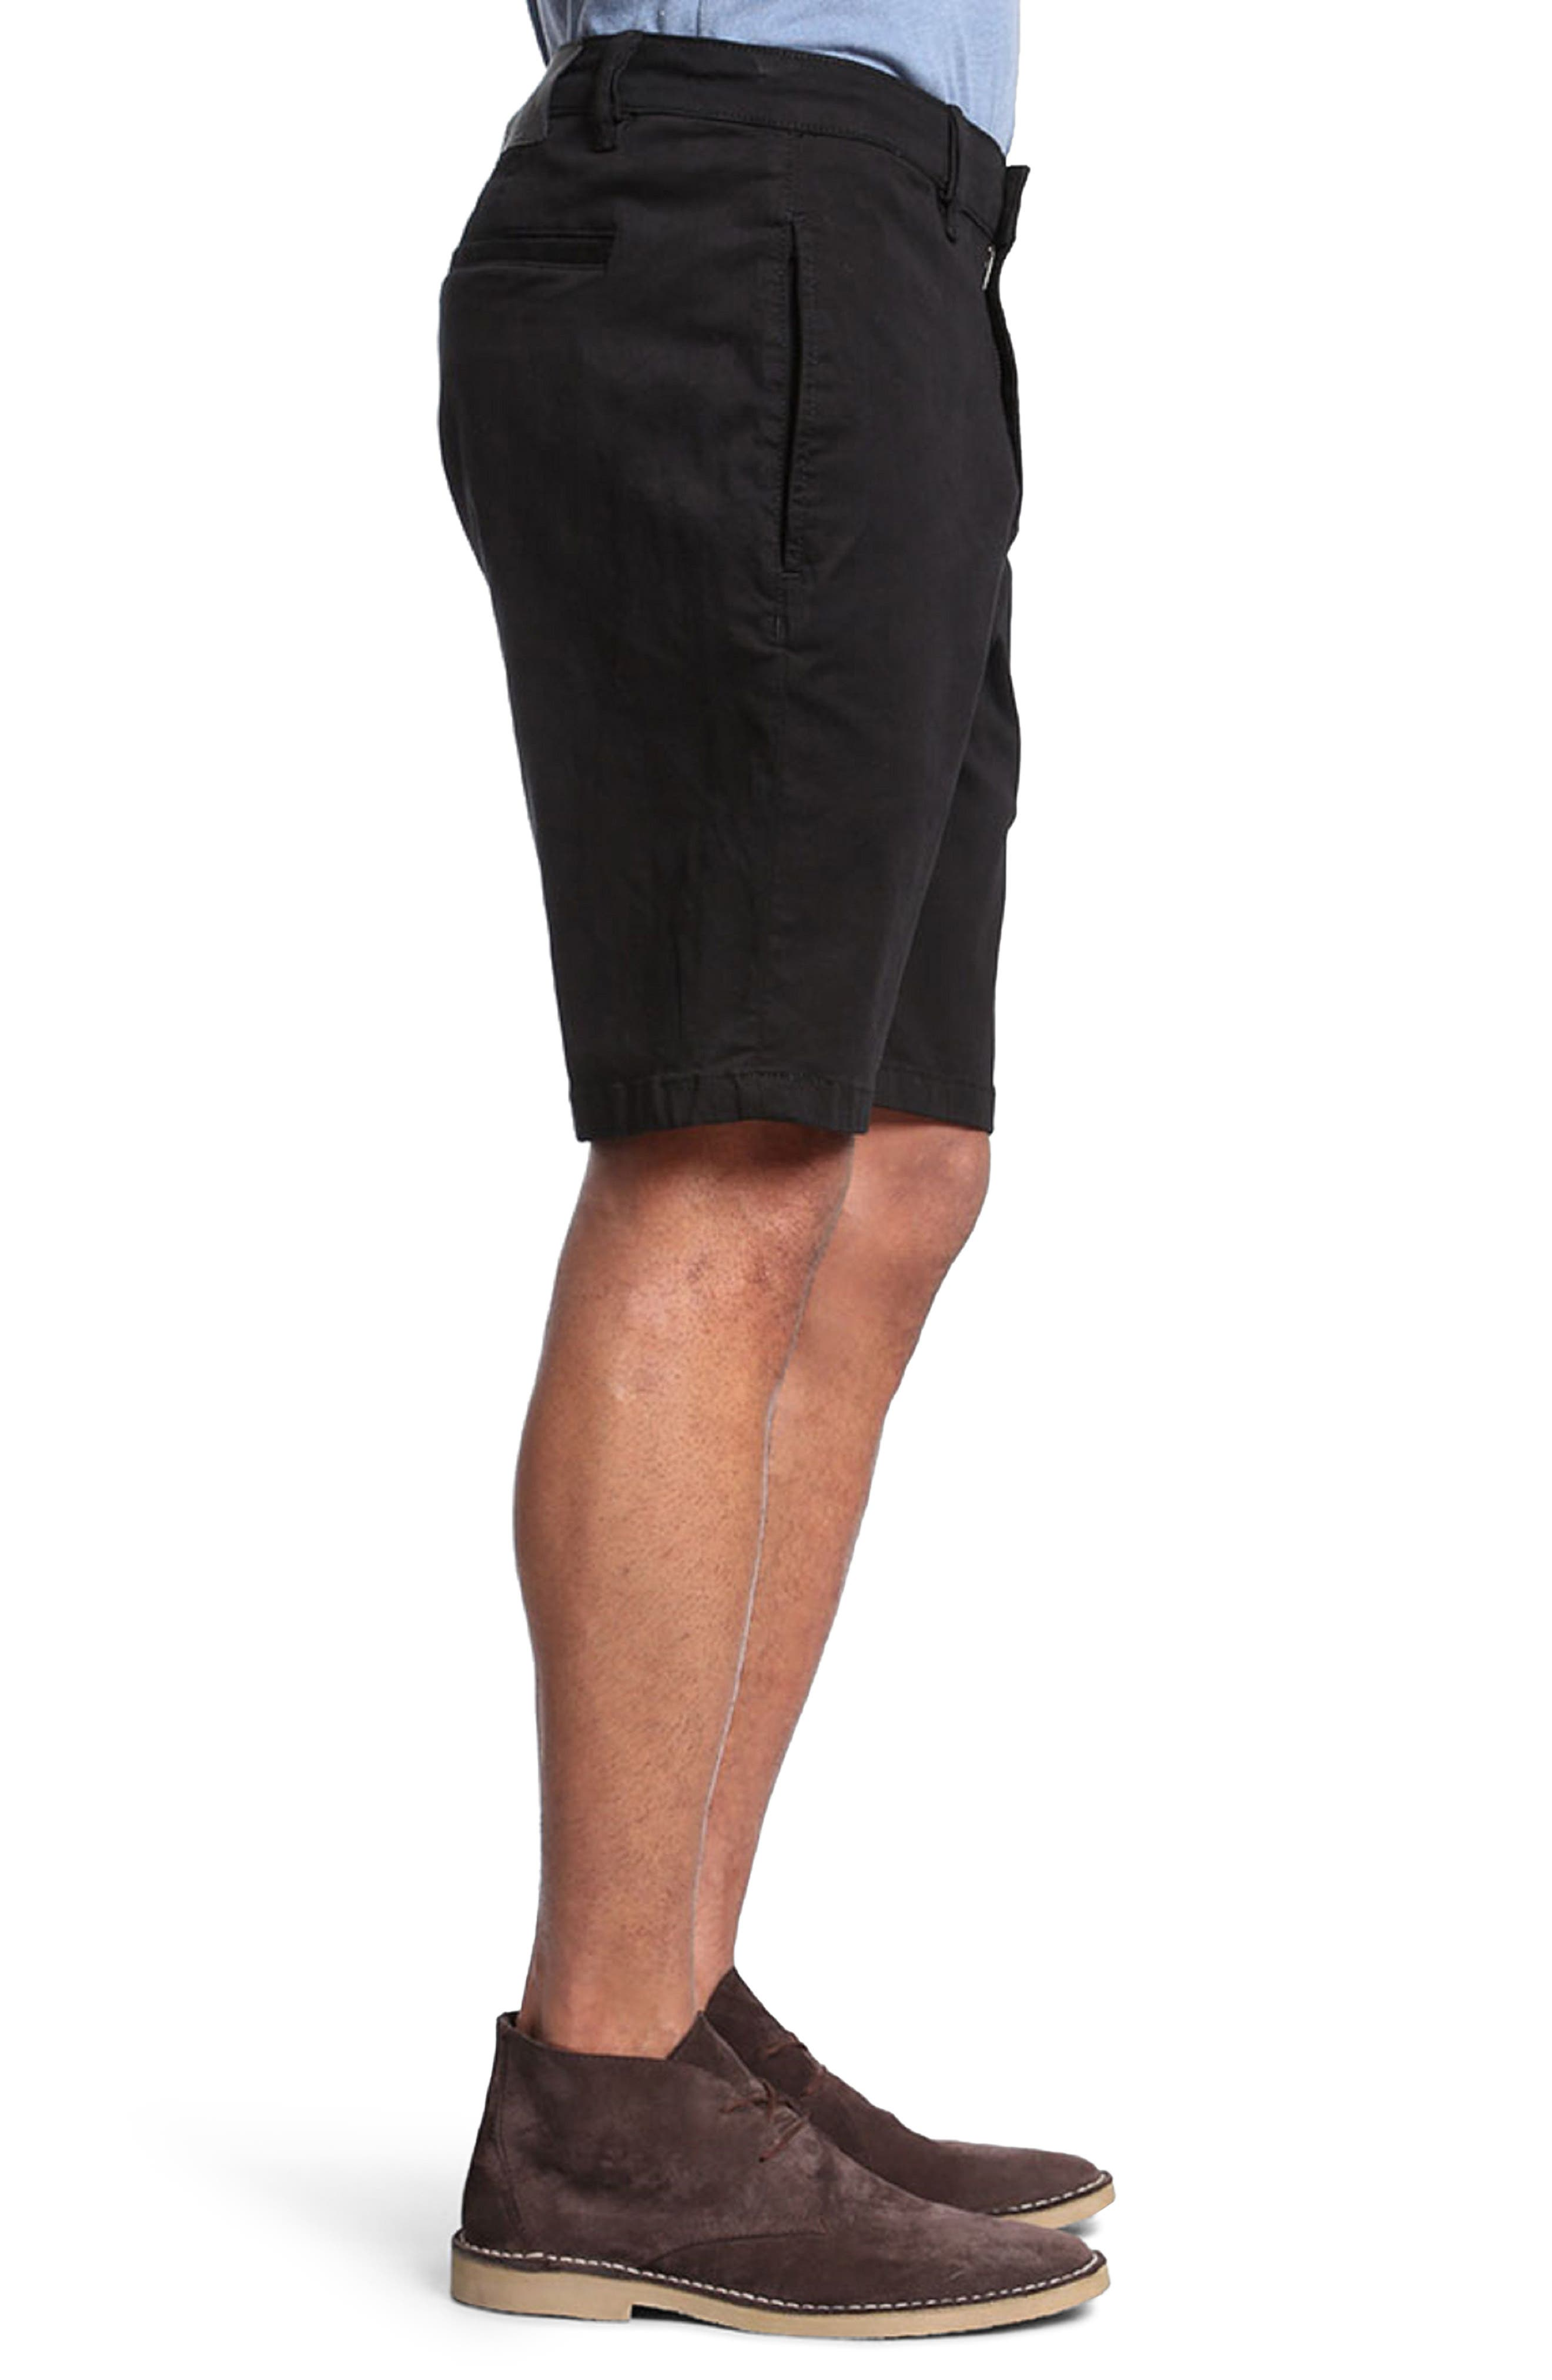 Nevada Twill Shorts,                             Alternate thumbnail 3, color,                             BLACK TWILL